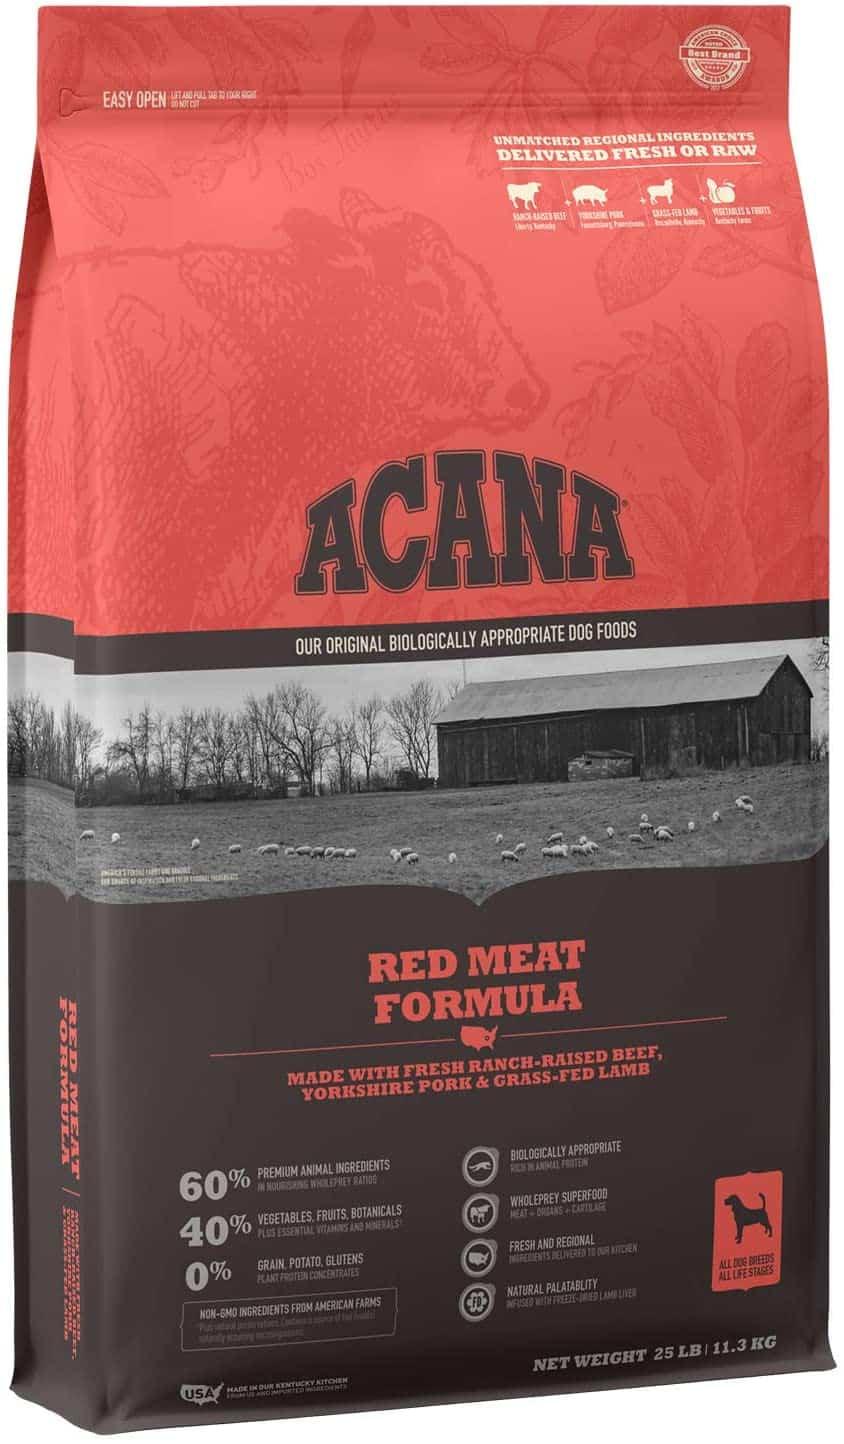 Red Meat Formula Acana Dog Food